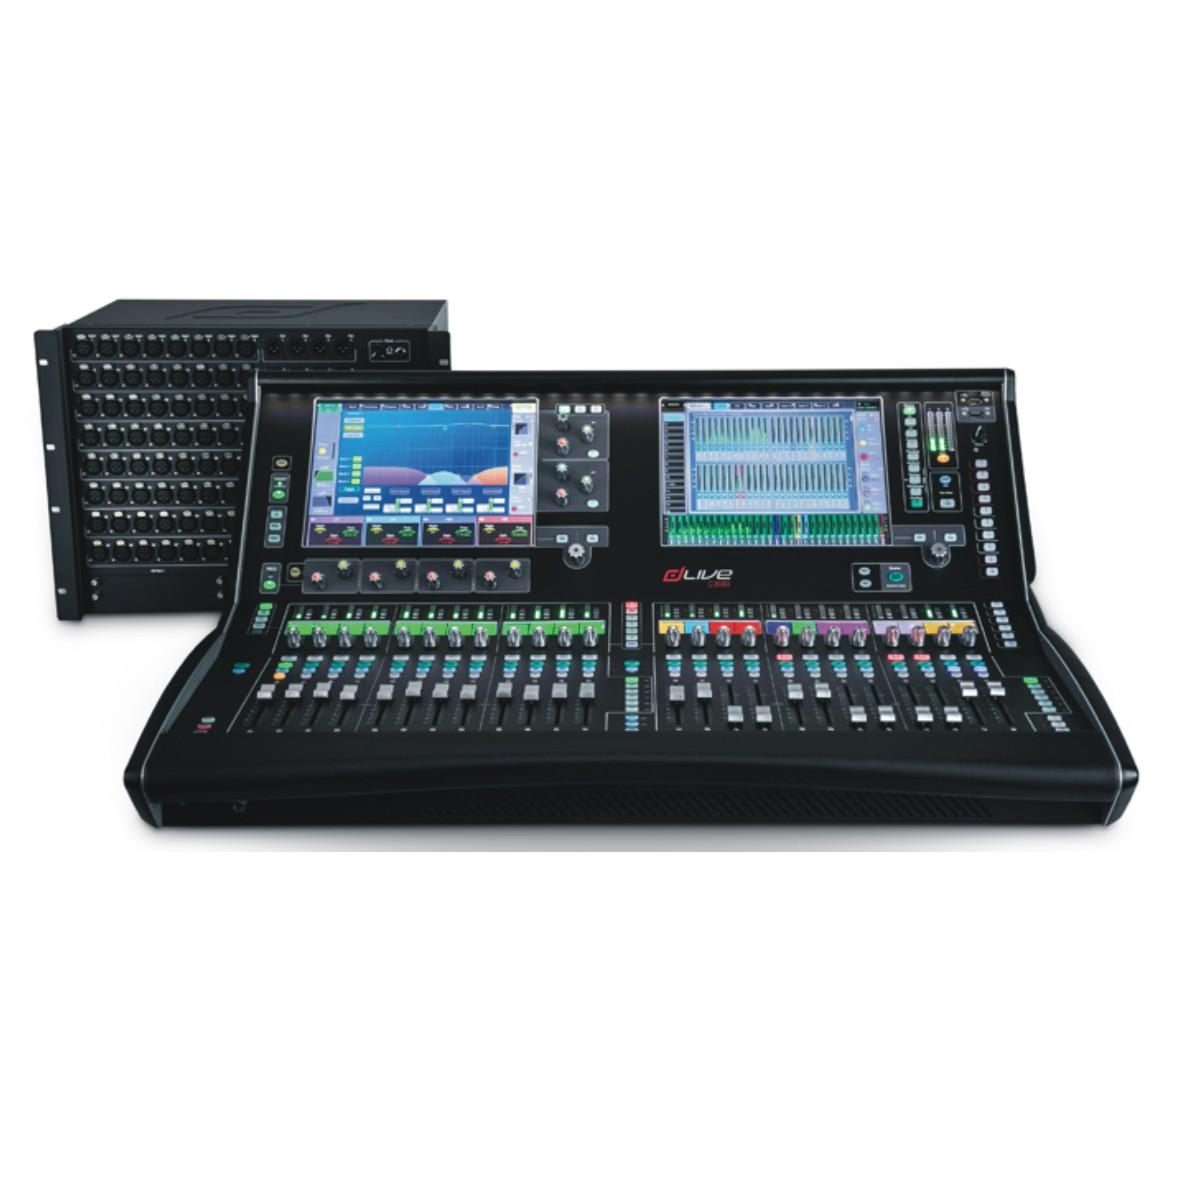 dLive C3500 数字调音台